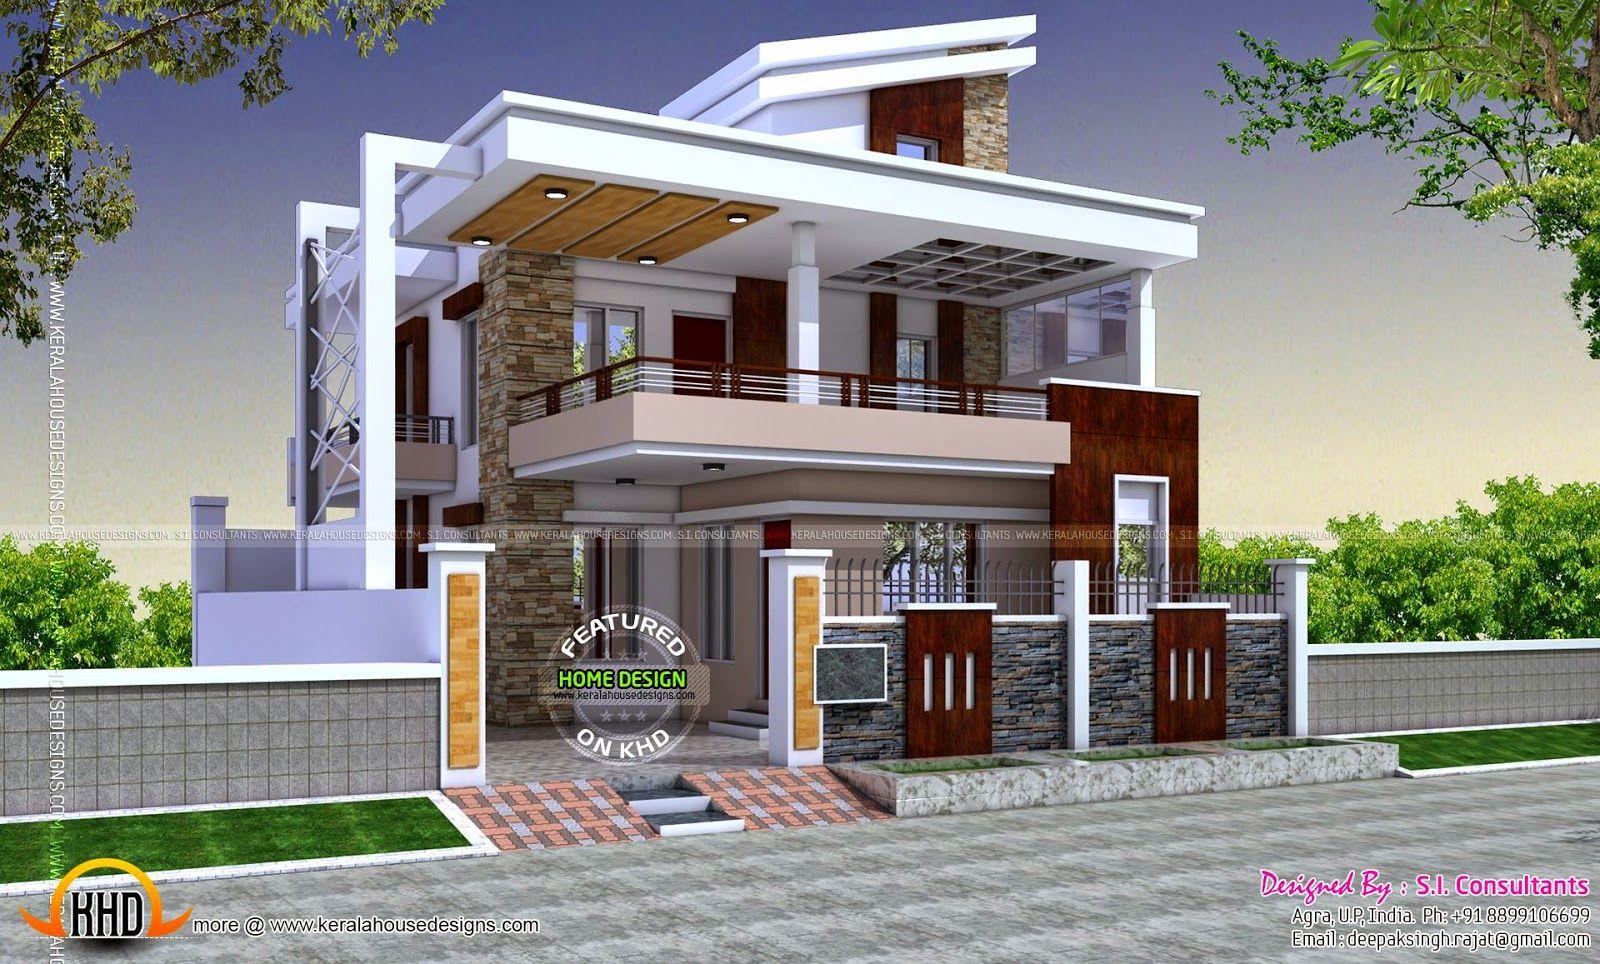 modern home design ideas outside 2017 of home exterior design 5 - Exterior Home Design Ideas